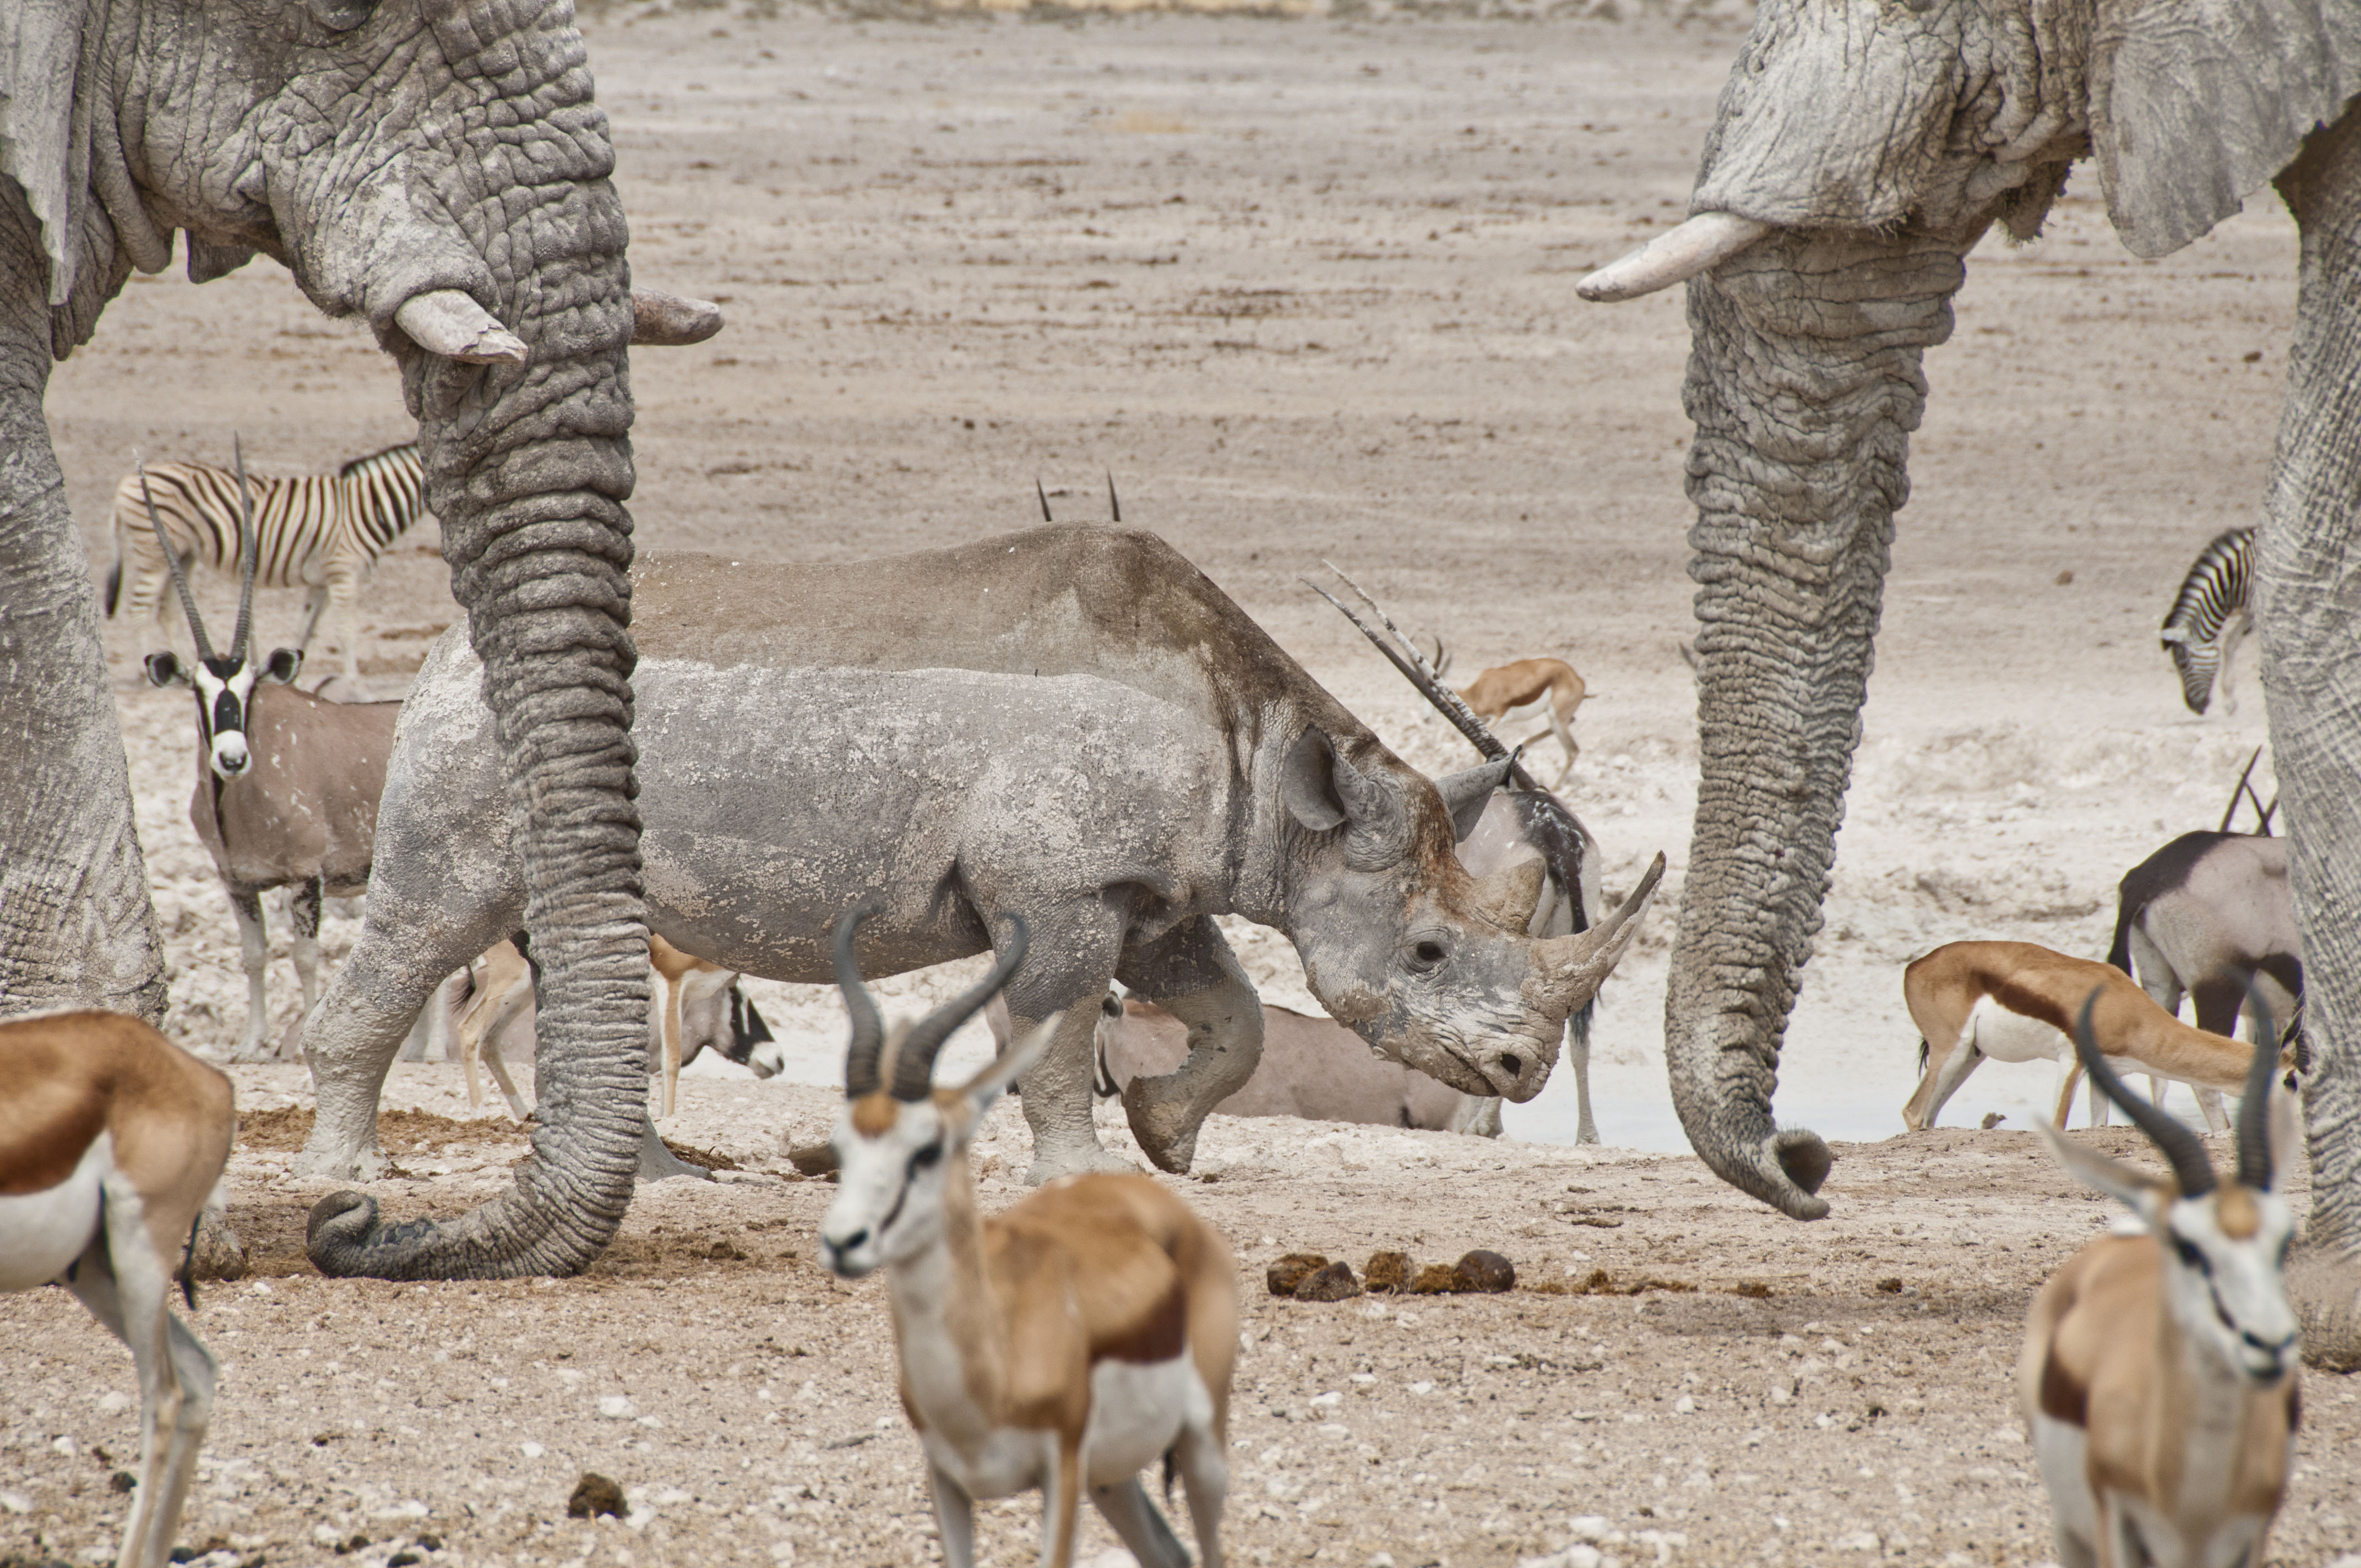 namibia_2014_kaokoveld-etoscha_085